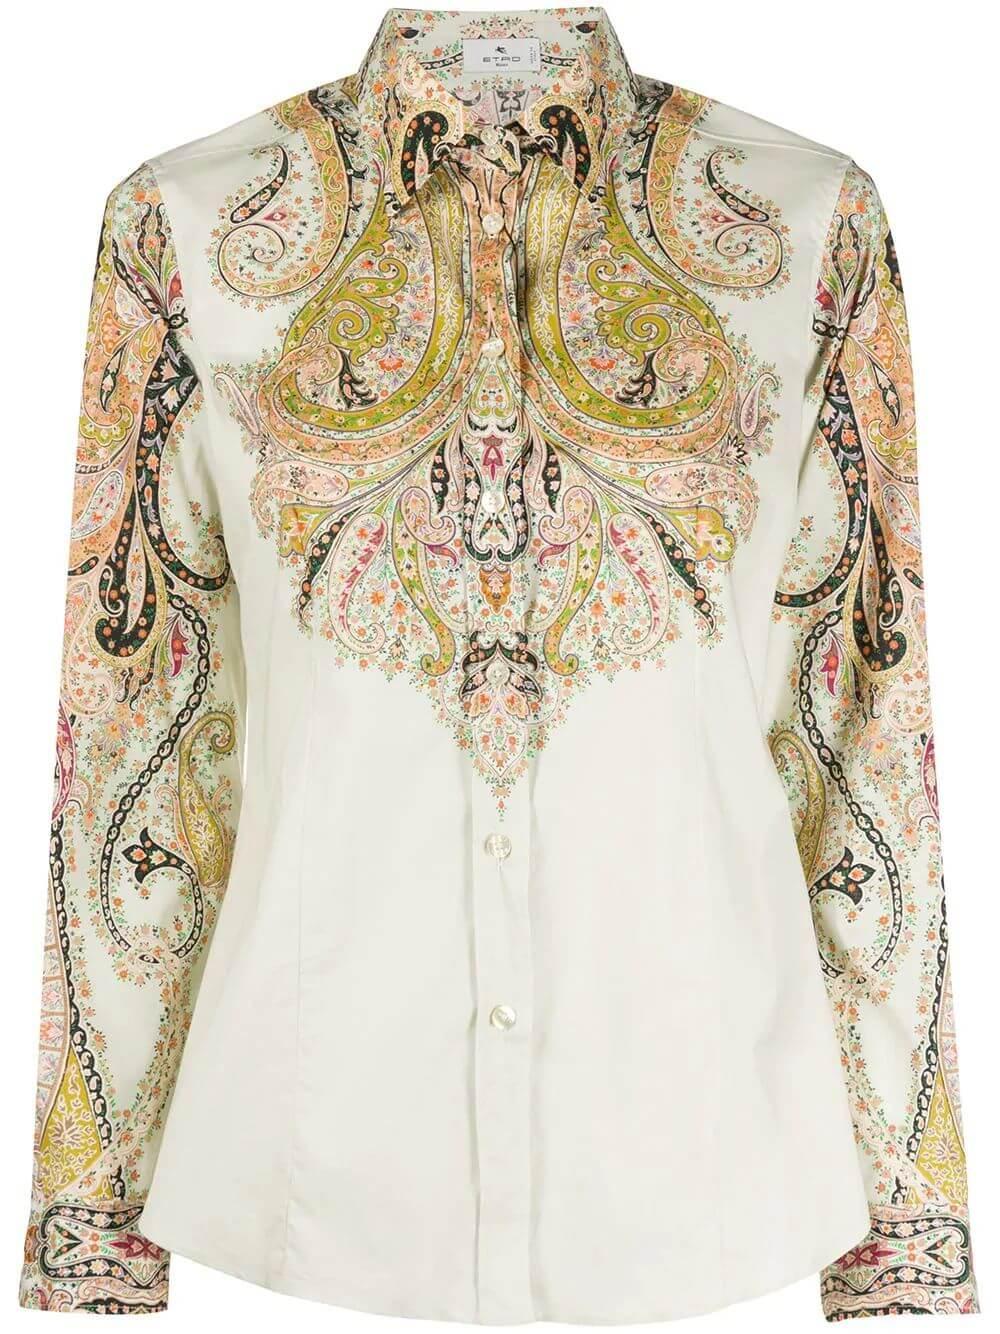 Camicia Sciancrata Paisley Cotton Blouse Item # 19030-9044